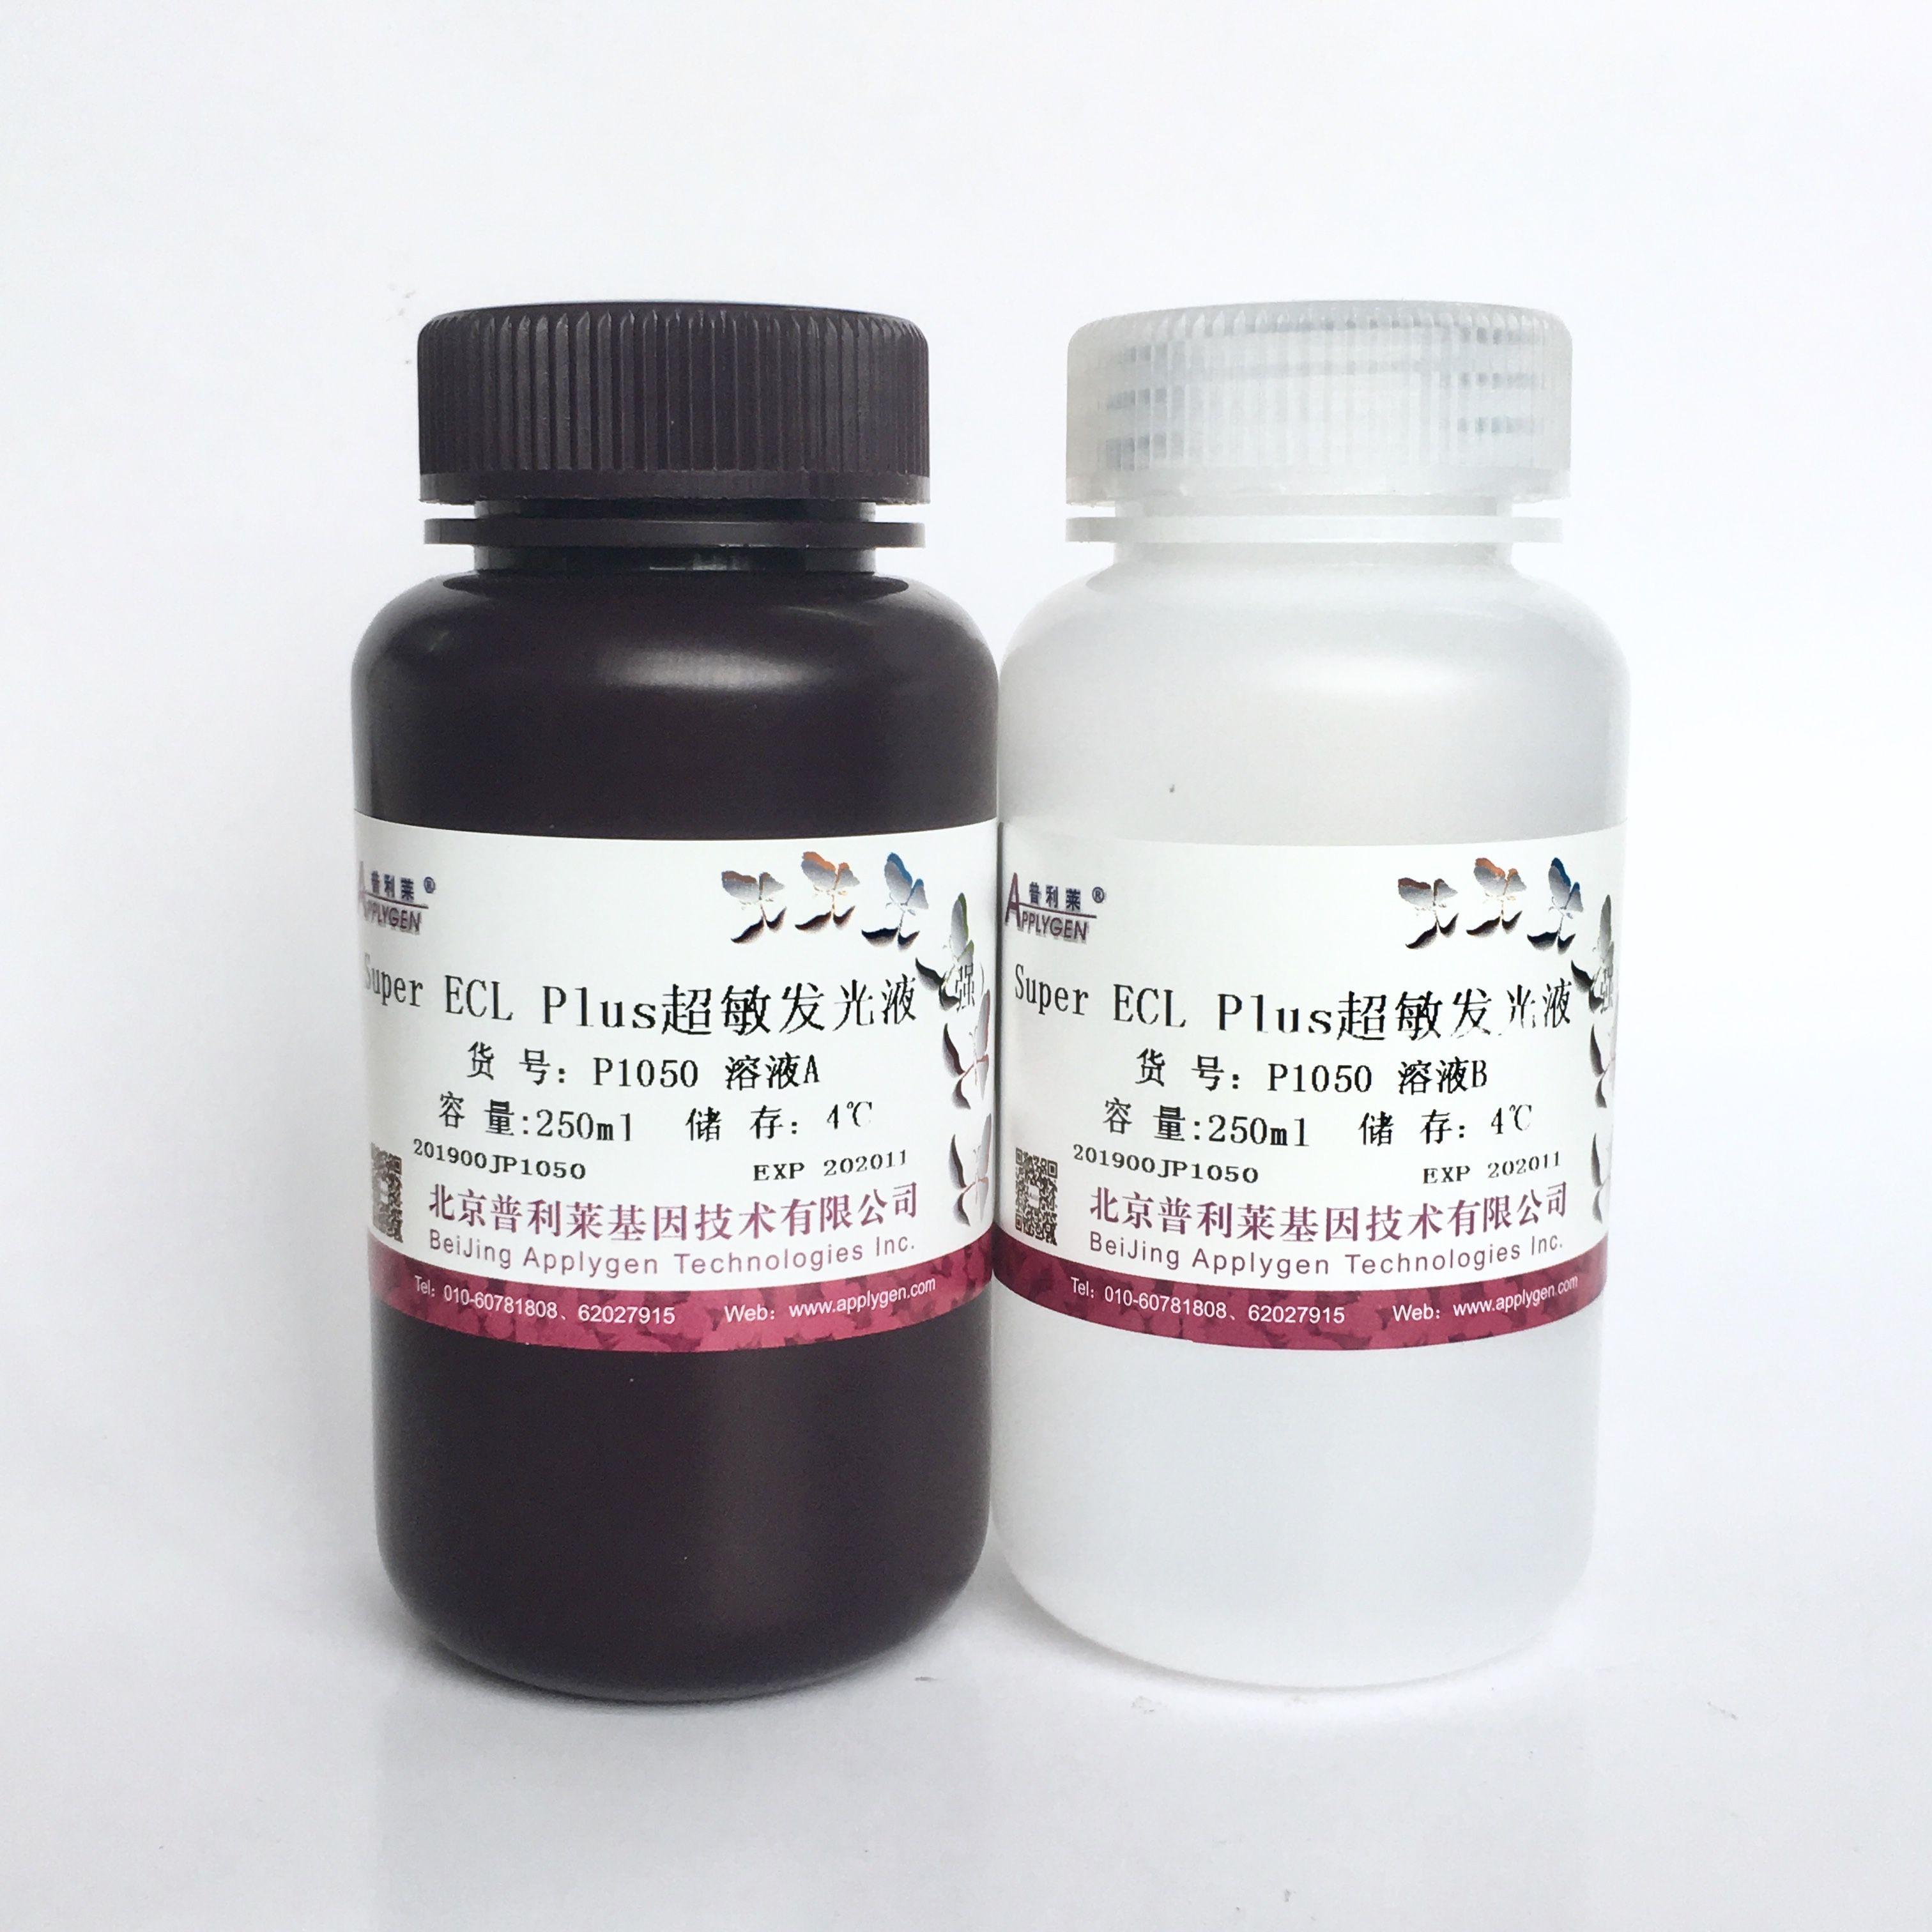 Super ECL Plus超敏发光液(强) P1050